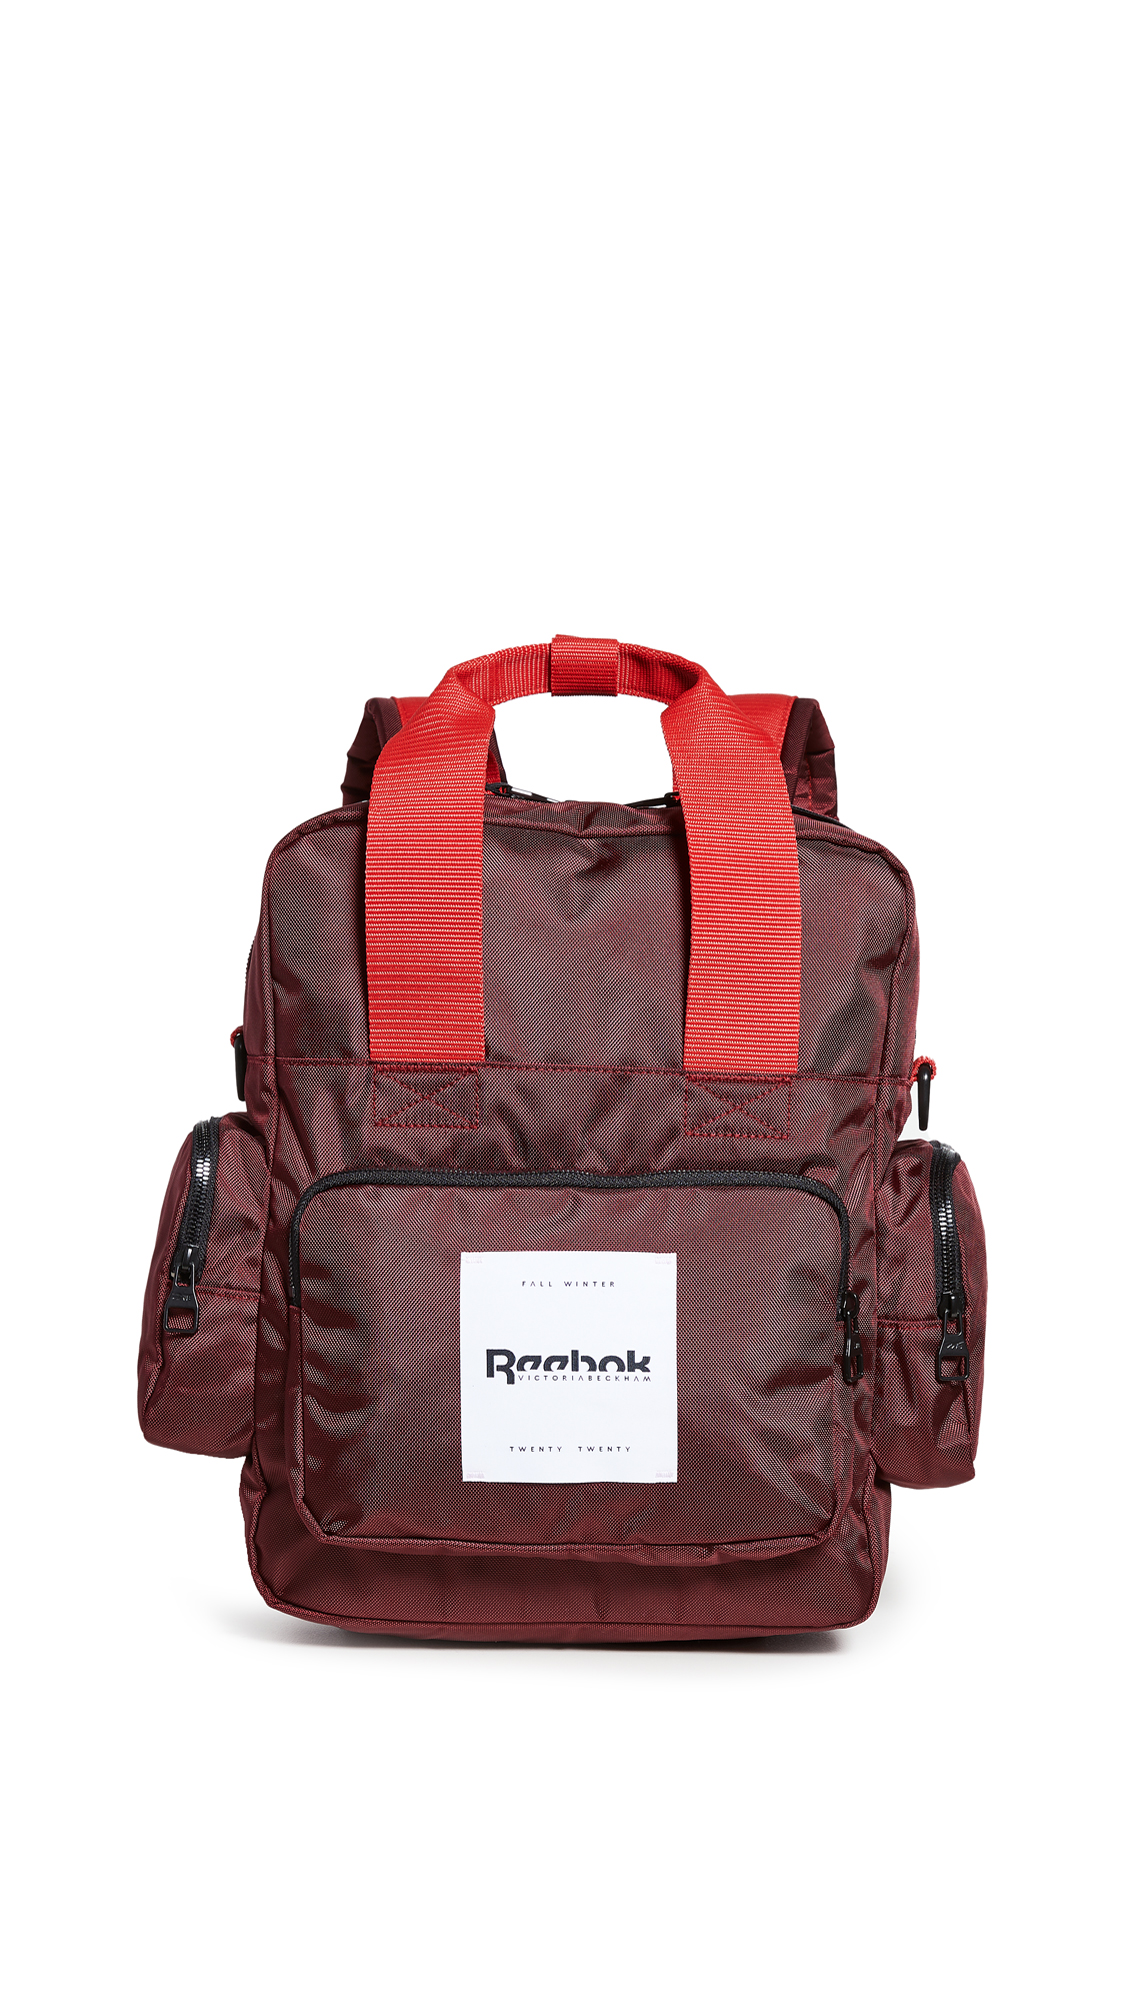 Reebok x Victoria Beckham RBK VB Convertible Tote Backpack